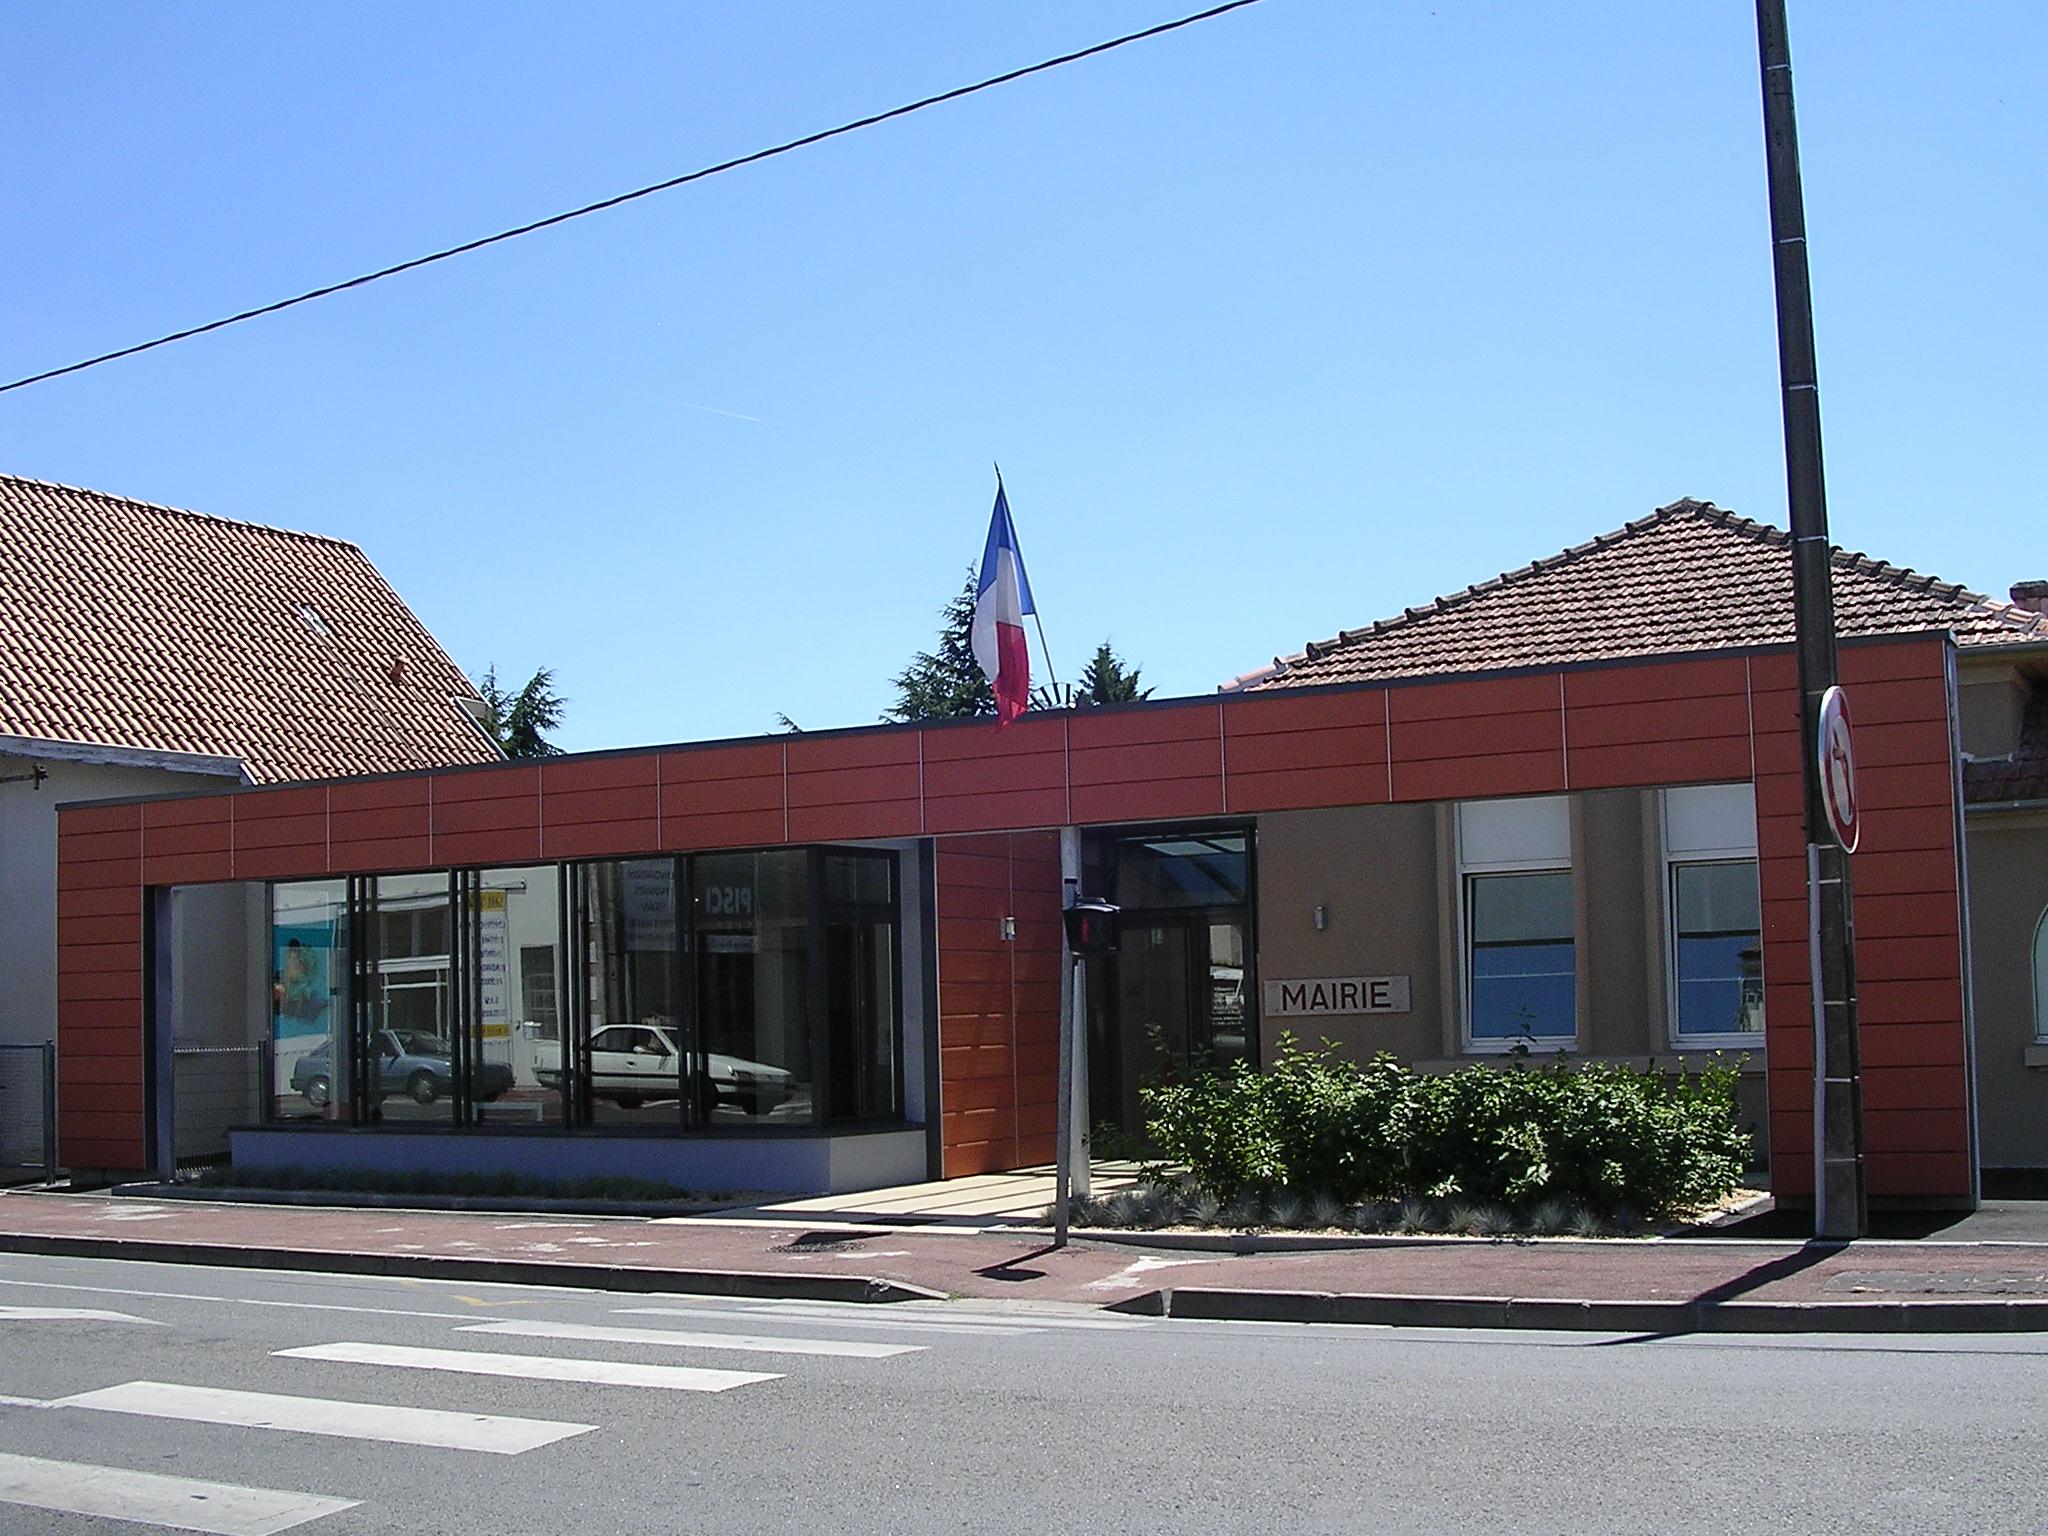 mairie reconstruite en 2006